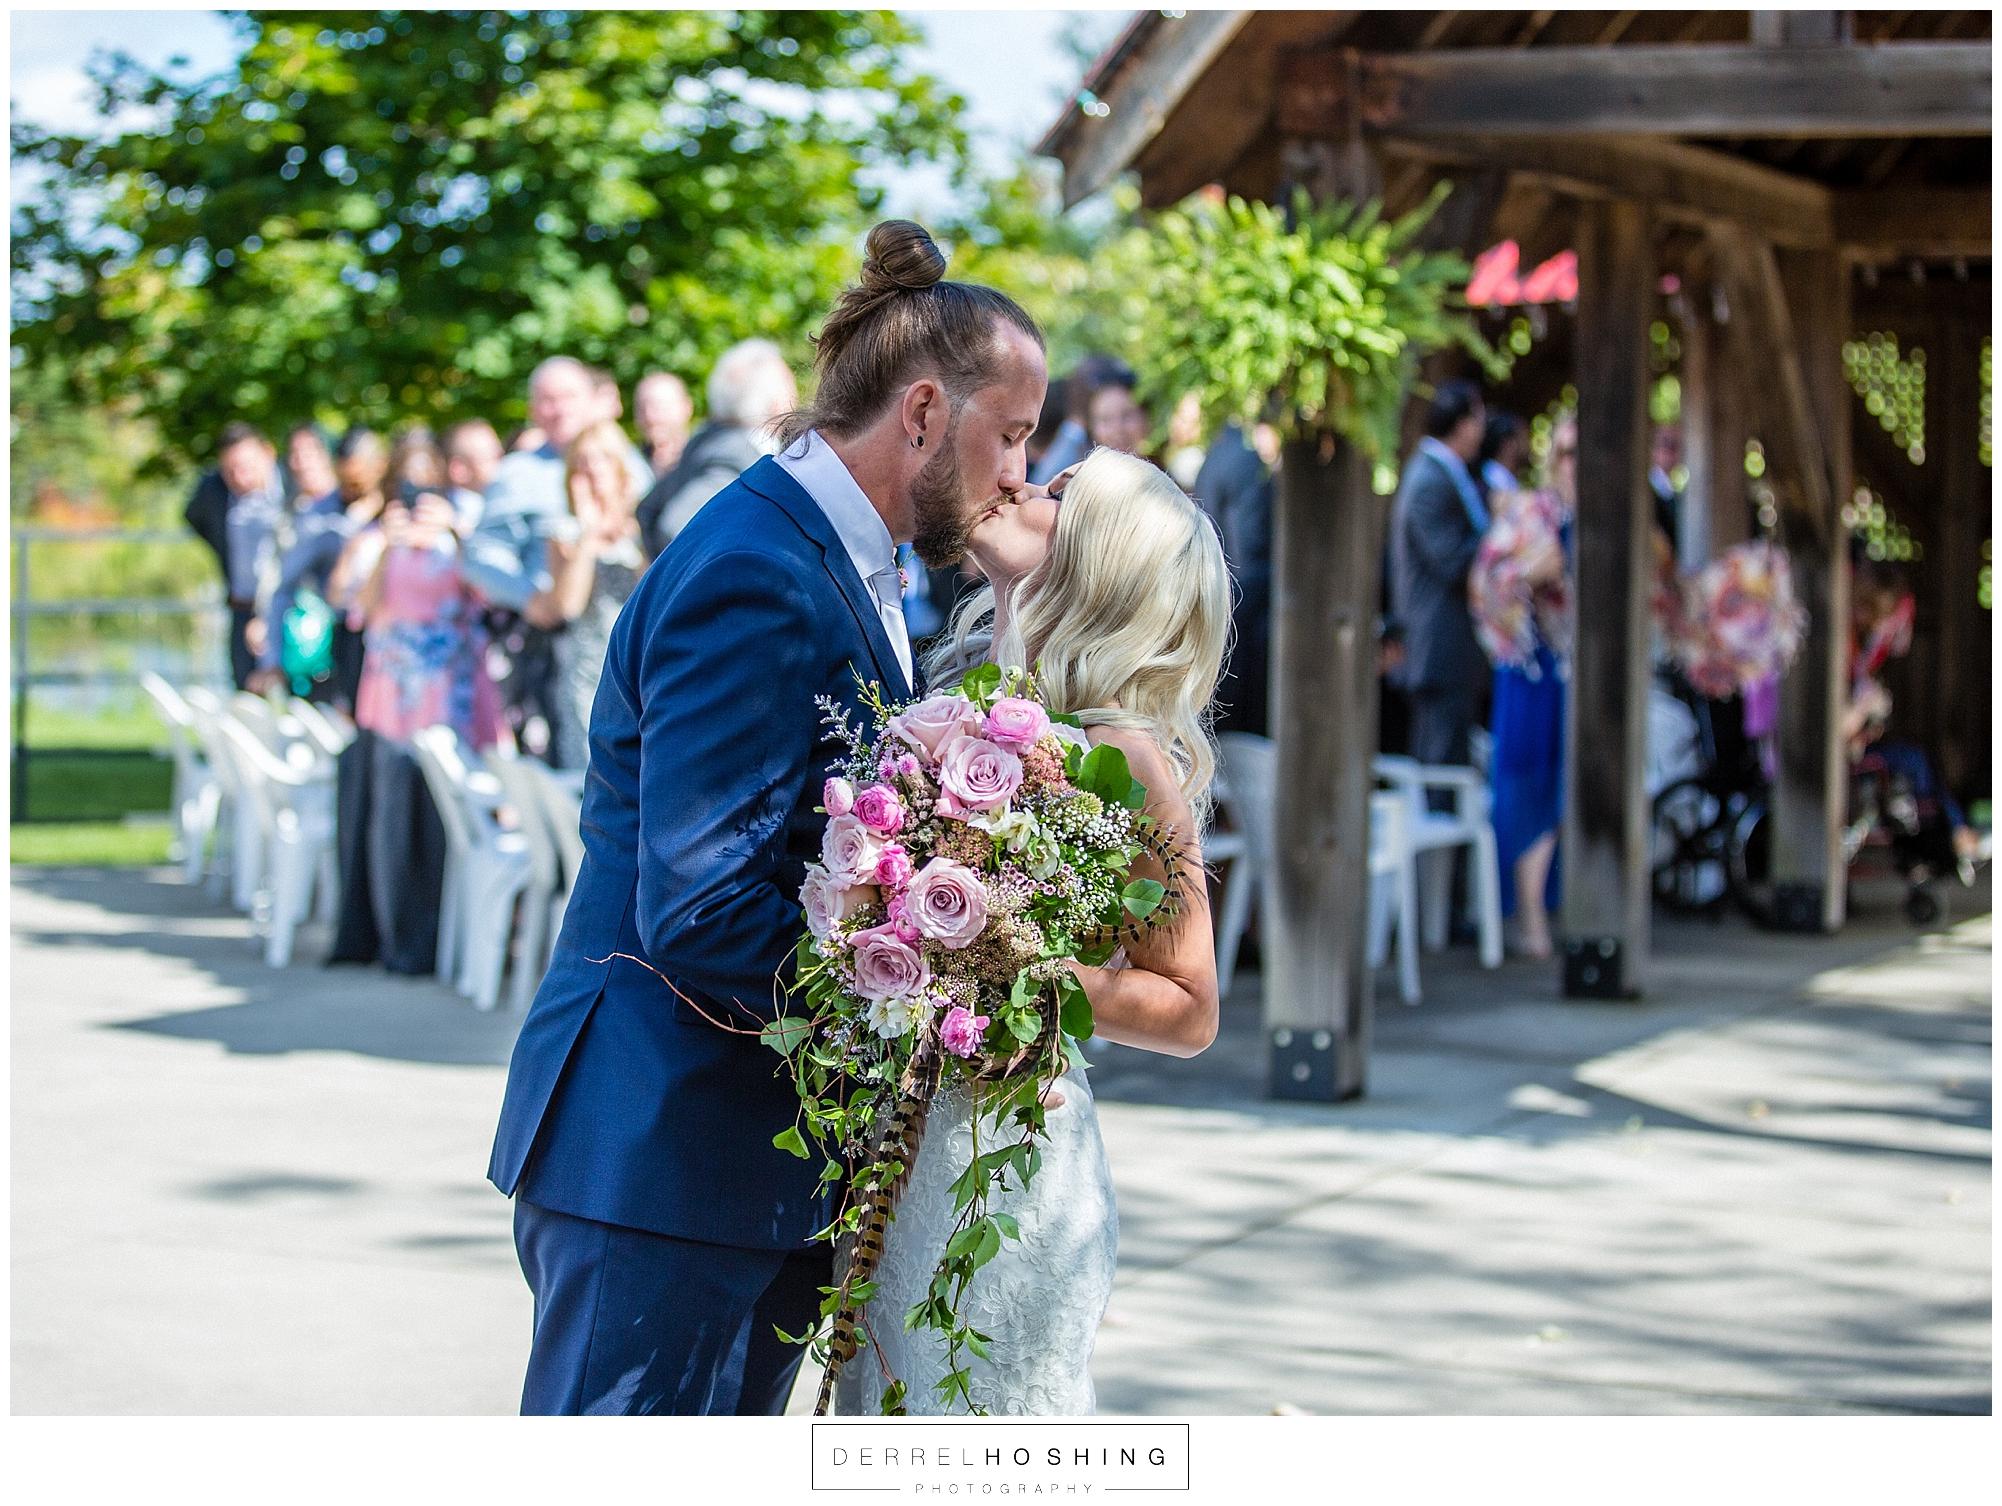 Belcroft-Estates-&-Event-Centre-Wedding-Innisfil-Ontario-0010.jpg